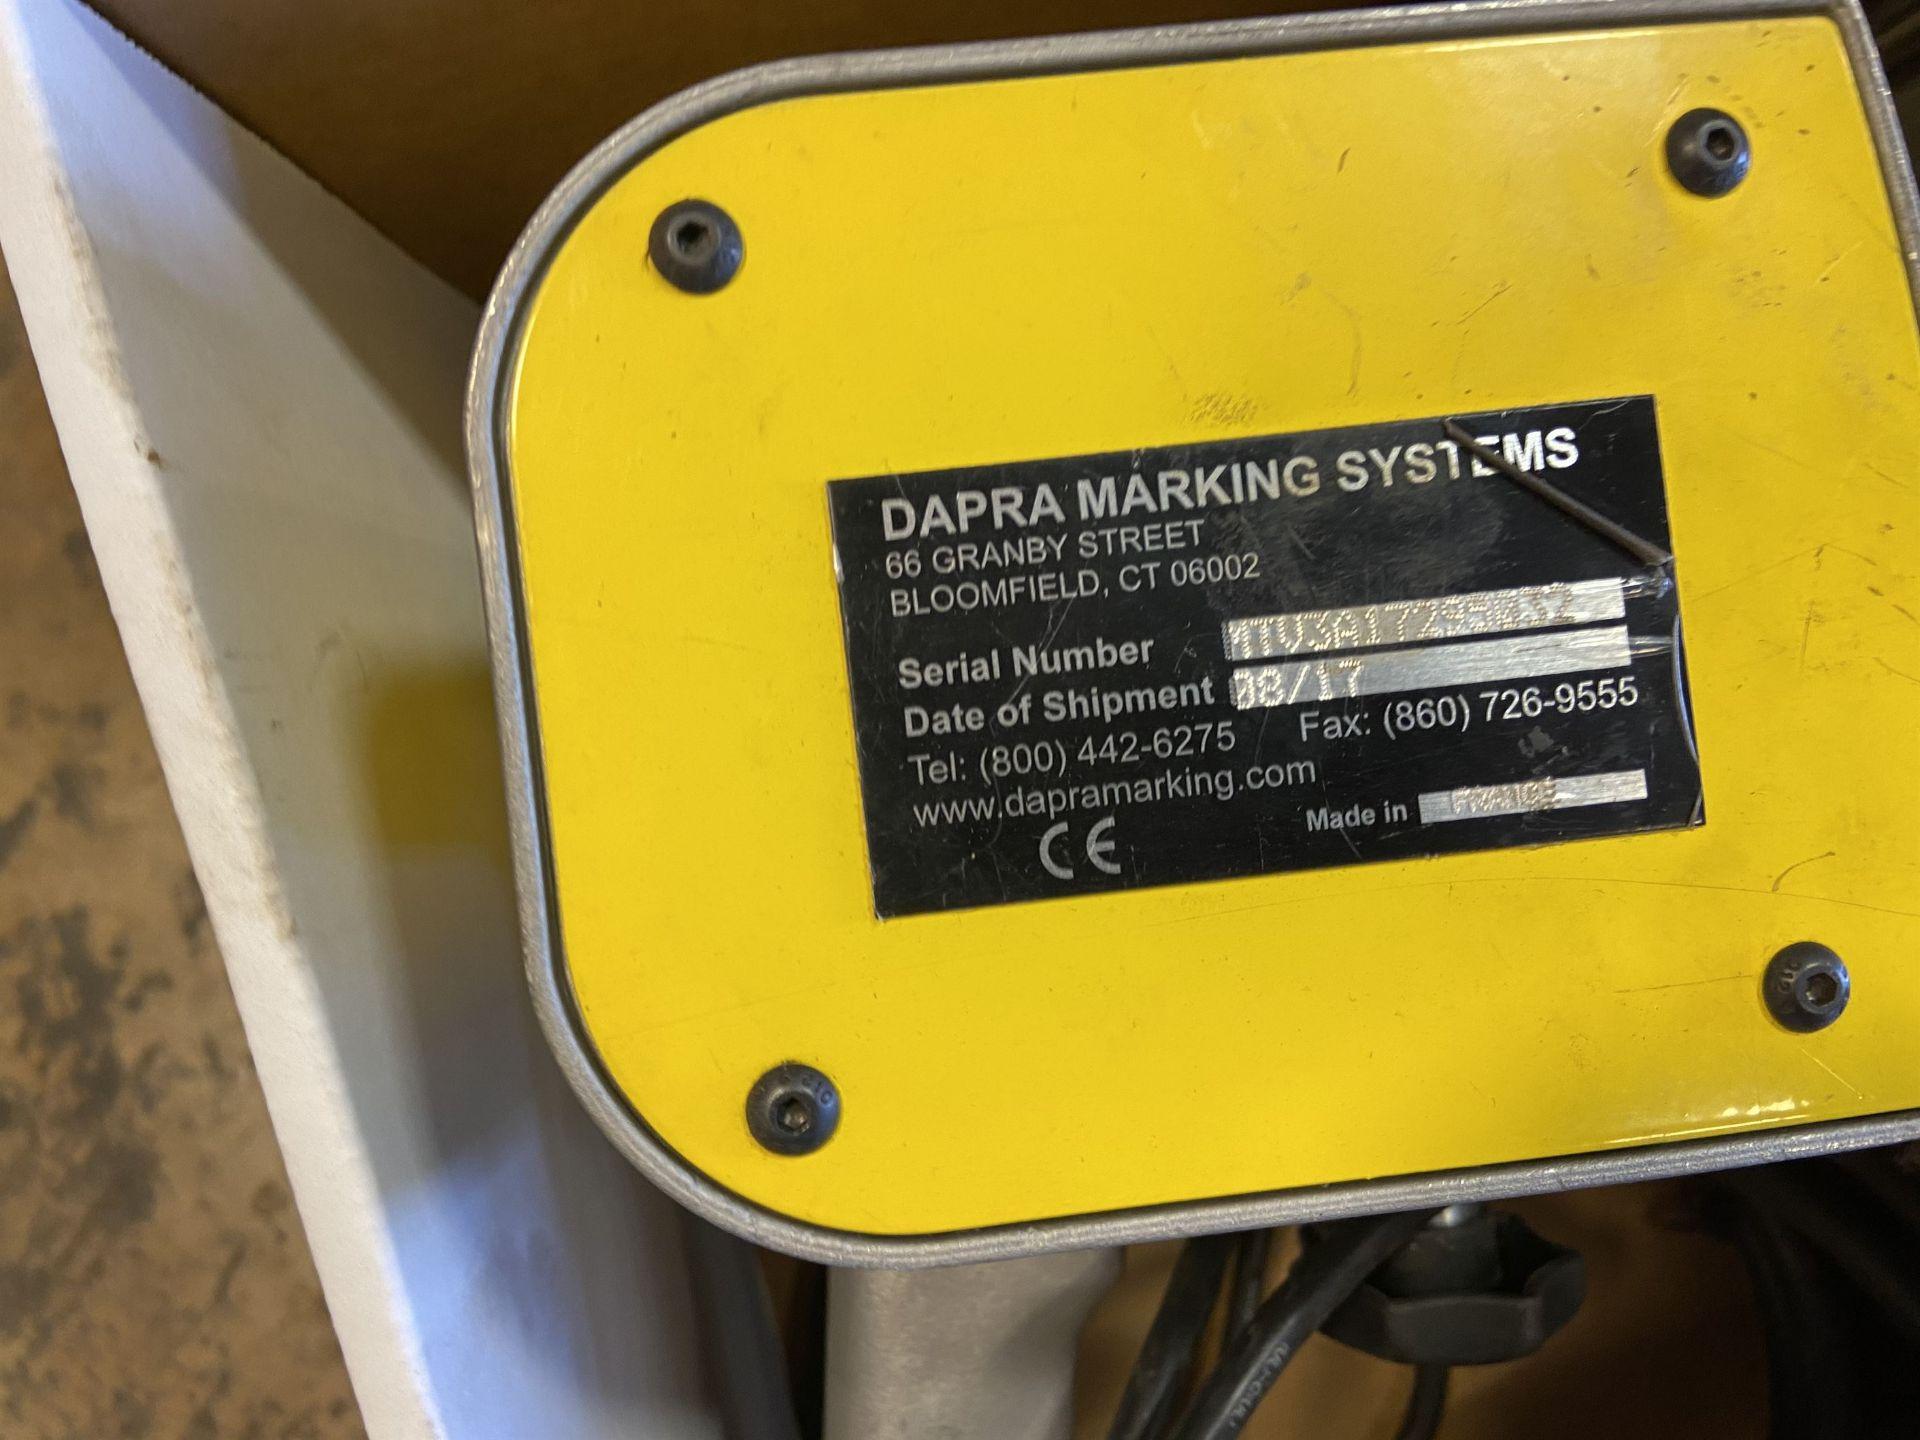 2017 Dapra Technomark Multi 4 Marking Machine with Stand s/n MTV3A17295032 - Image 2 of 2